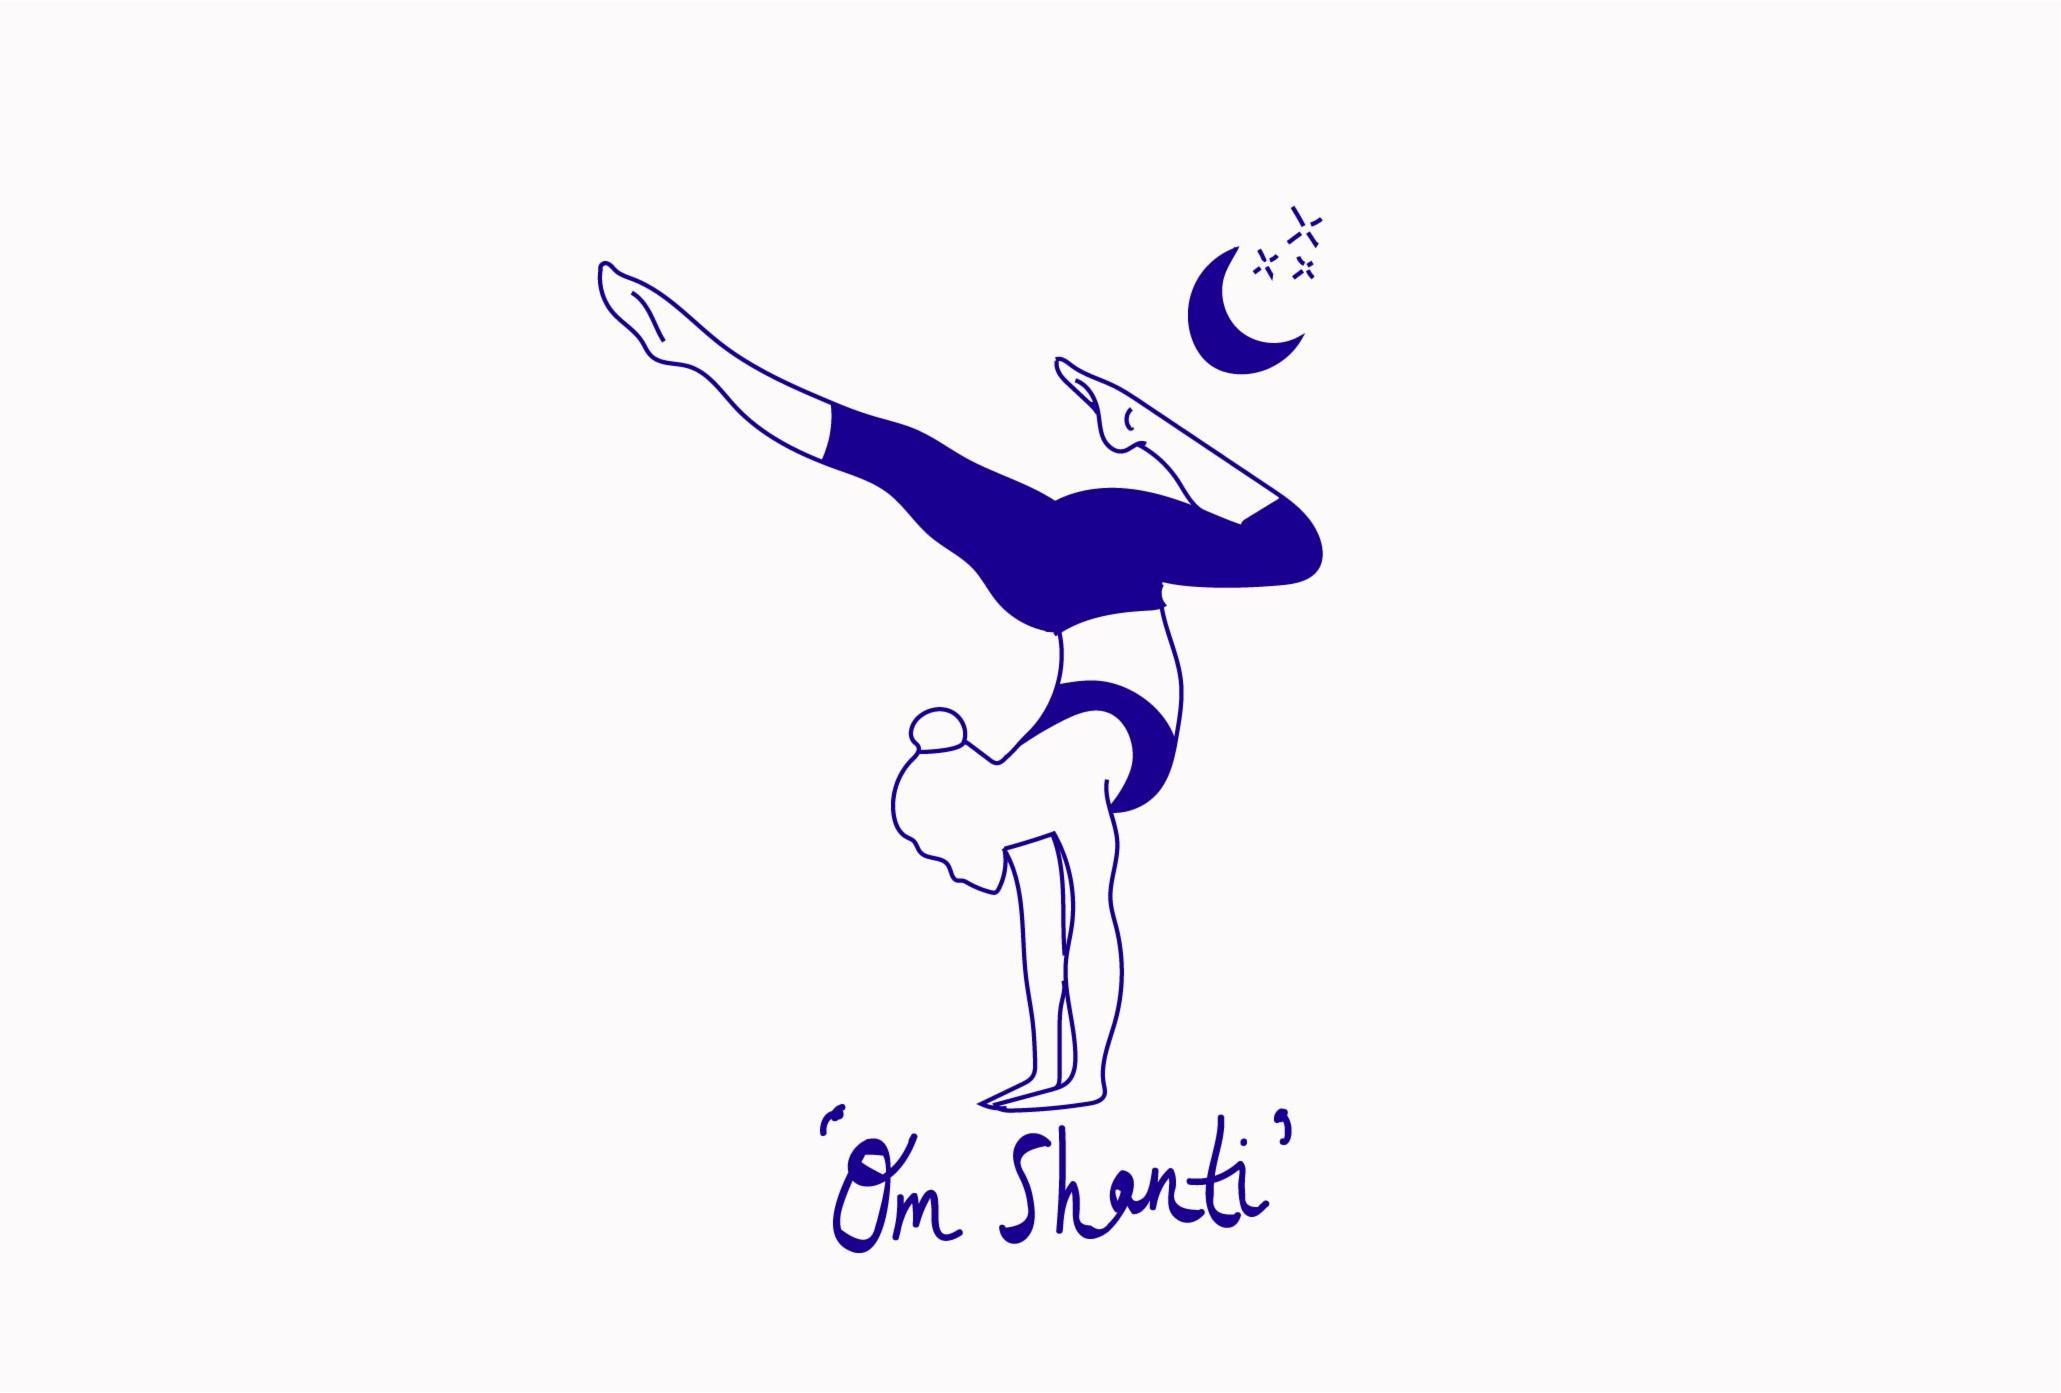 yoga pose illustration by SouthEast15